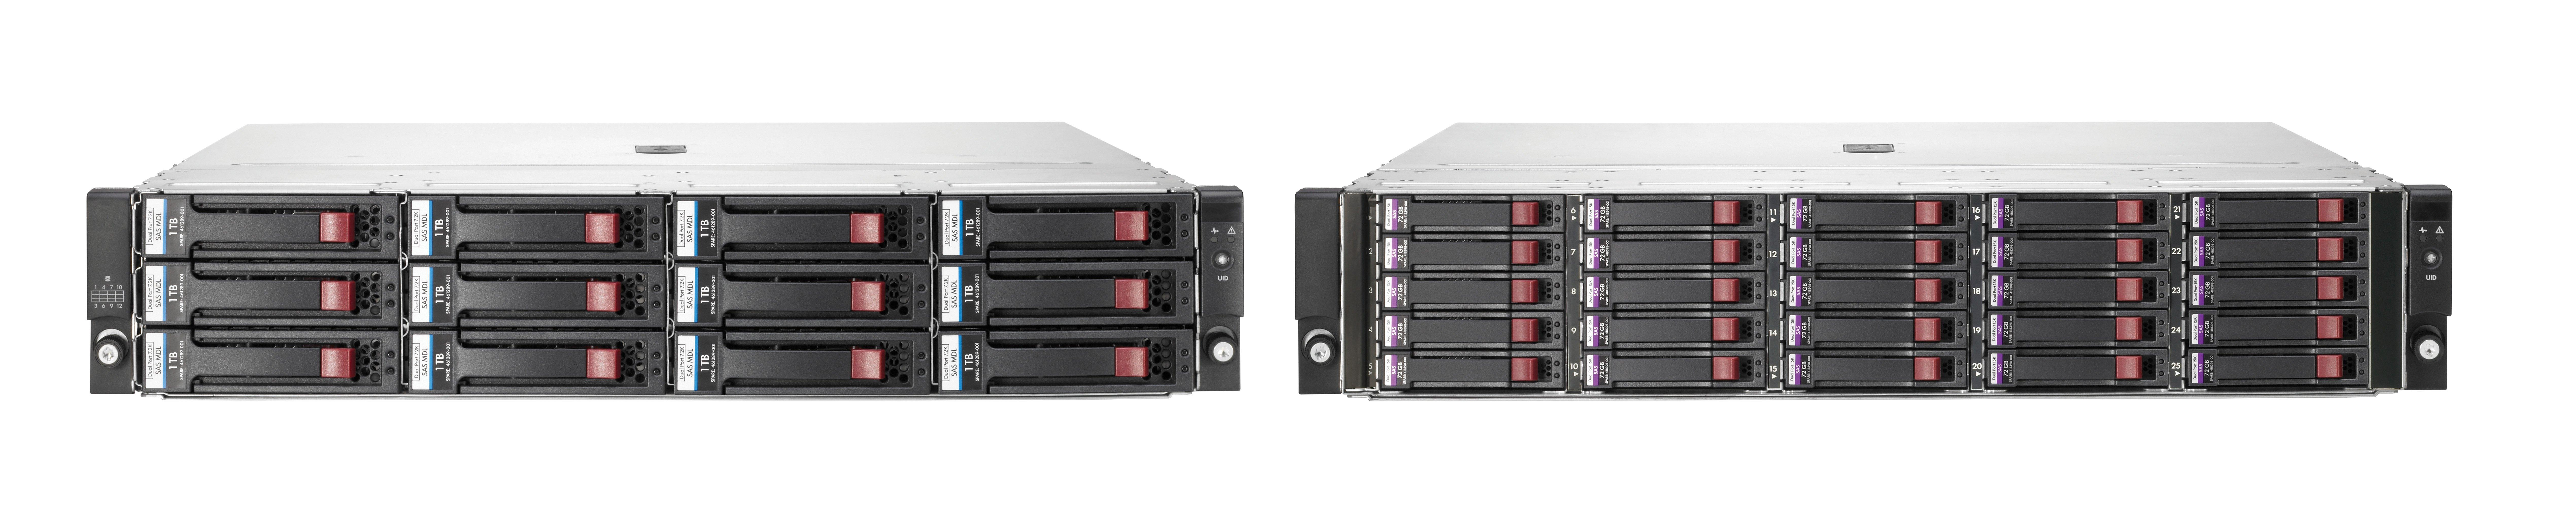 HPE StorageWorks Disk Enclosure D2700 bo tier de stockage AJ941A